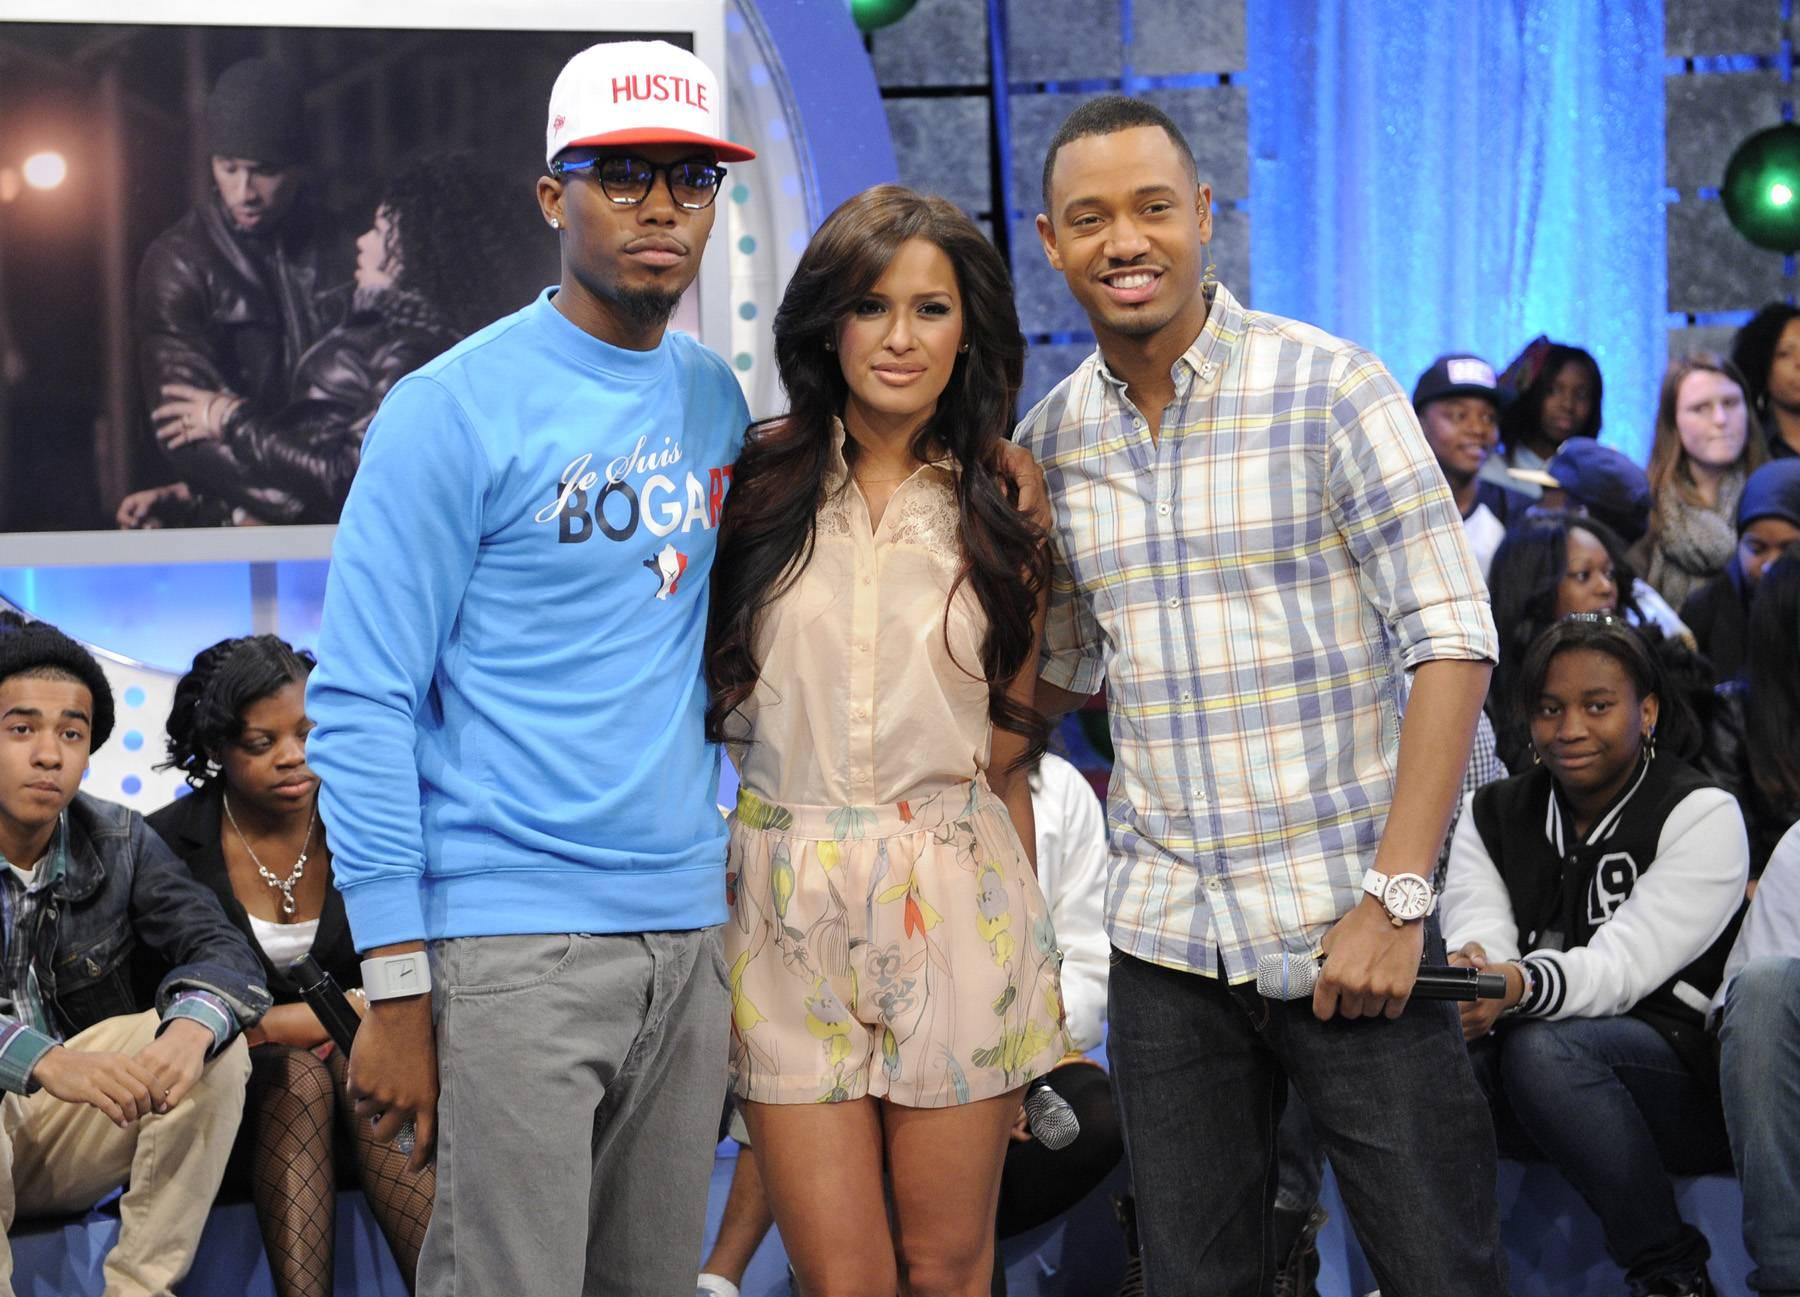 Line Up - B.o.B with Rocsi Diaz and Terrence J at 106 & Park, May 1, 2012. (Photo: John Ricard / BET)